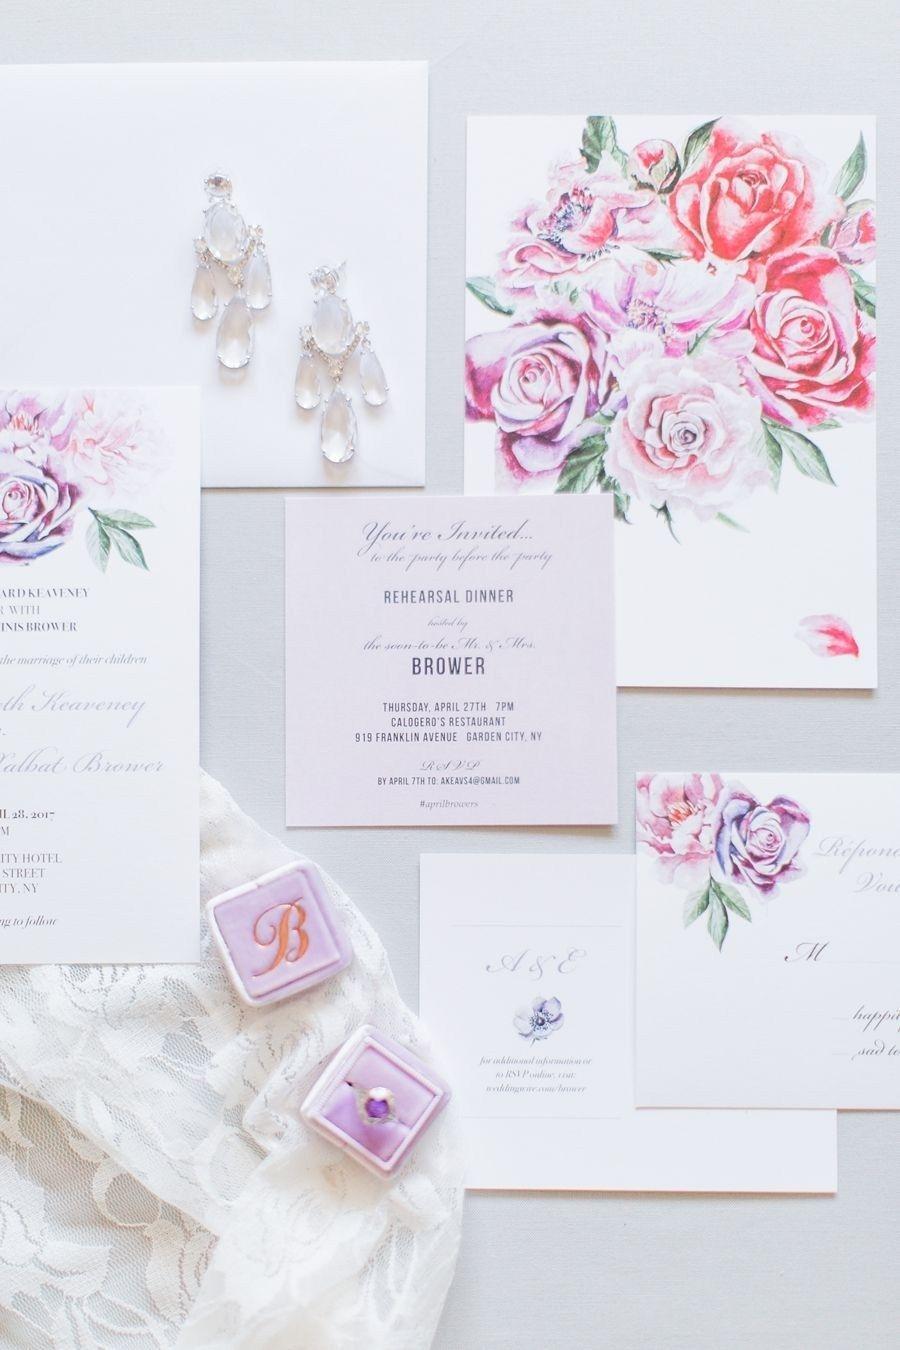 30 Great Image Of Spring Wedding Invitations Lavender Loving Springtime Pinterest: Unique Wedding Invitations Spring At Reisefeber.org